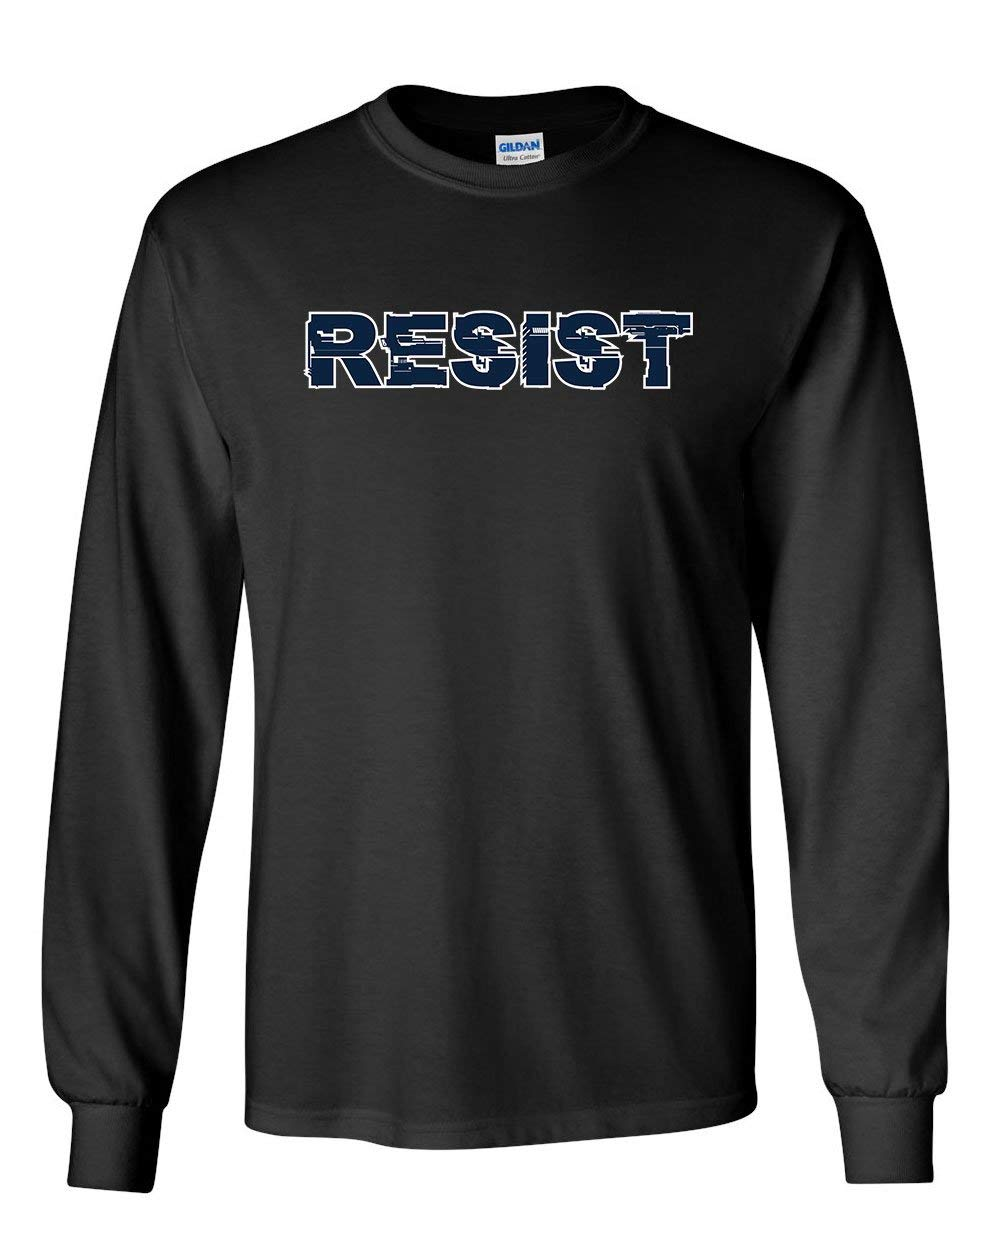 Resist T Shirt Anti Trump Not My President Impeach 45 Patriotic Tee